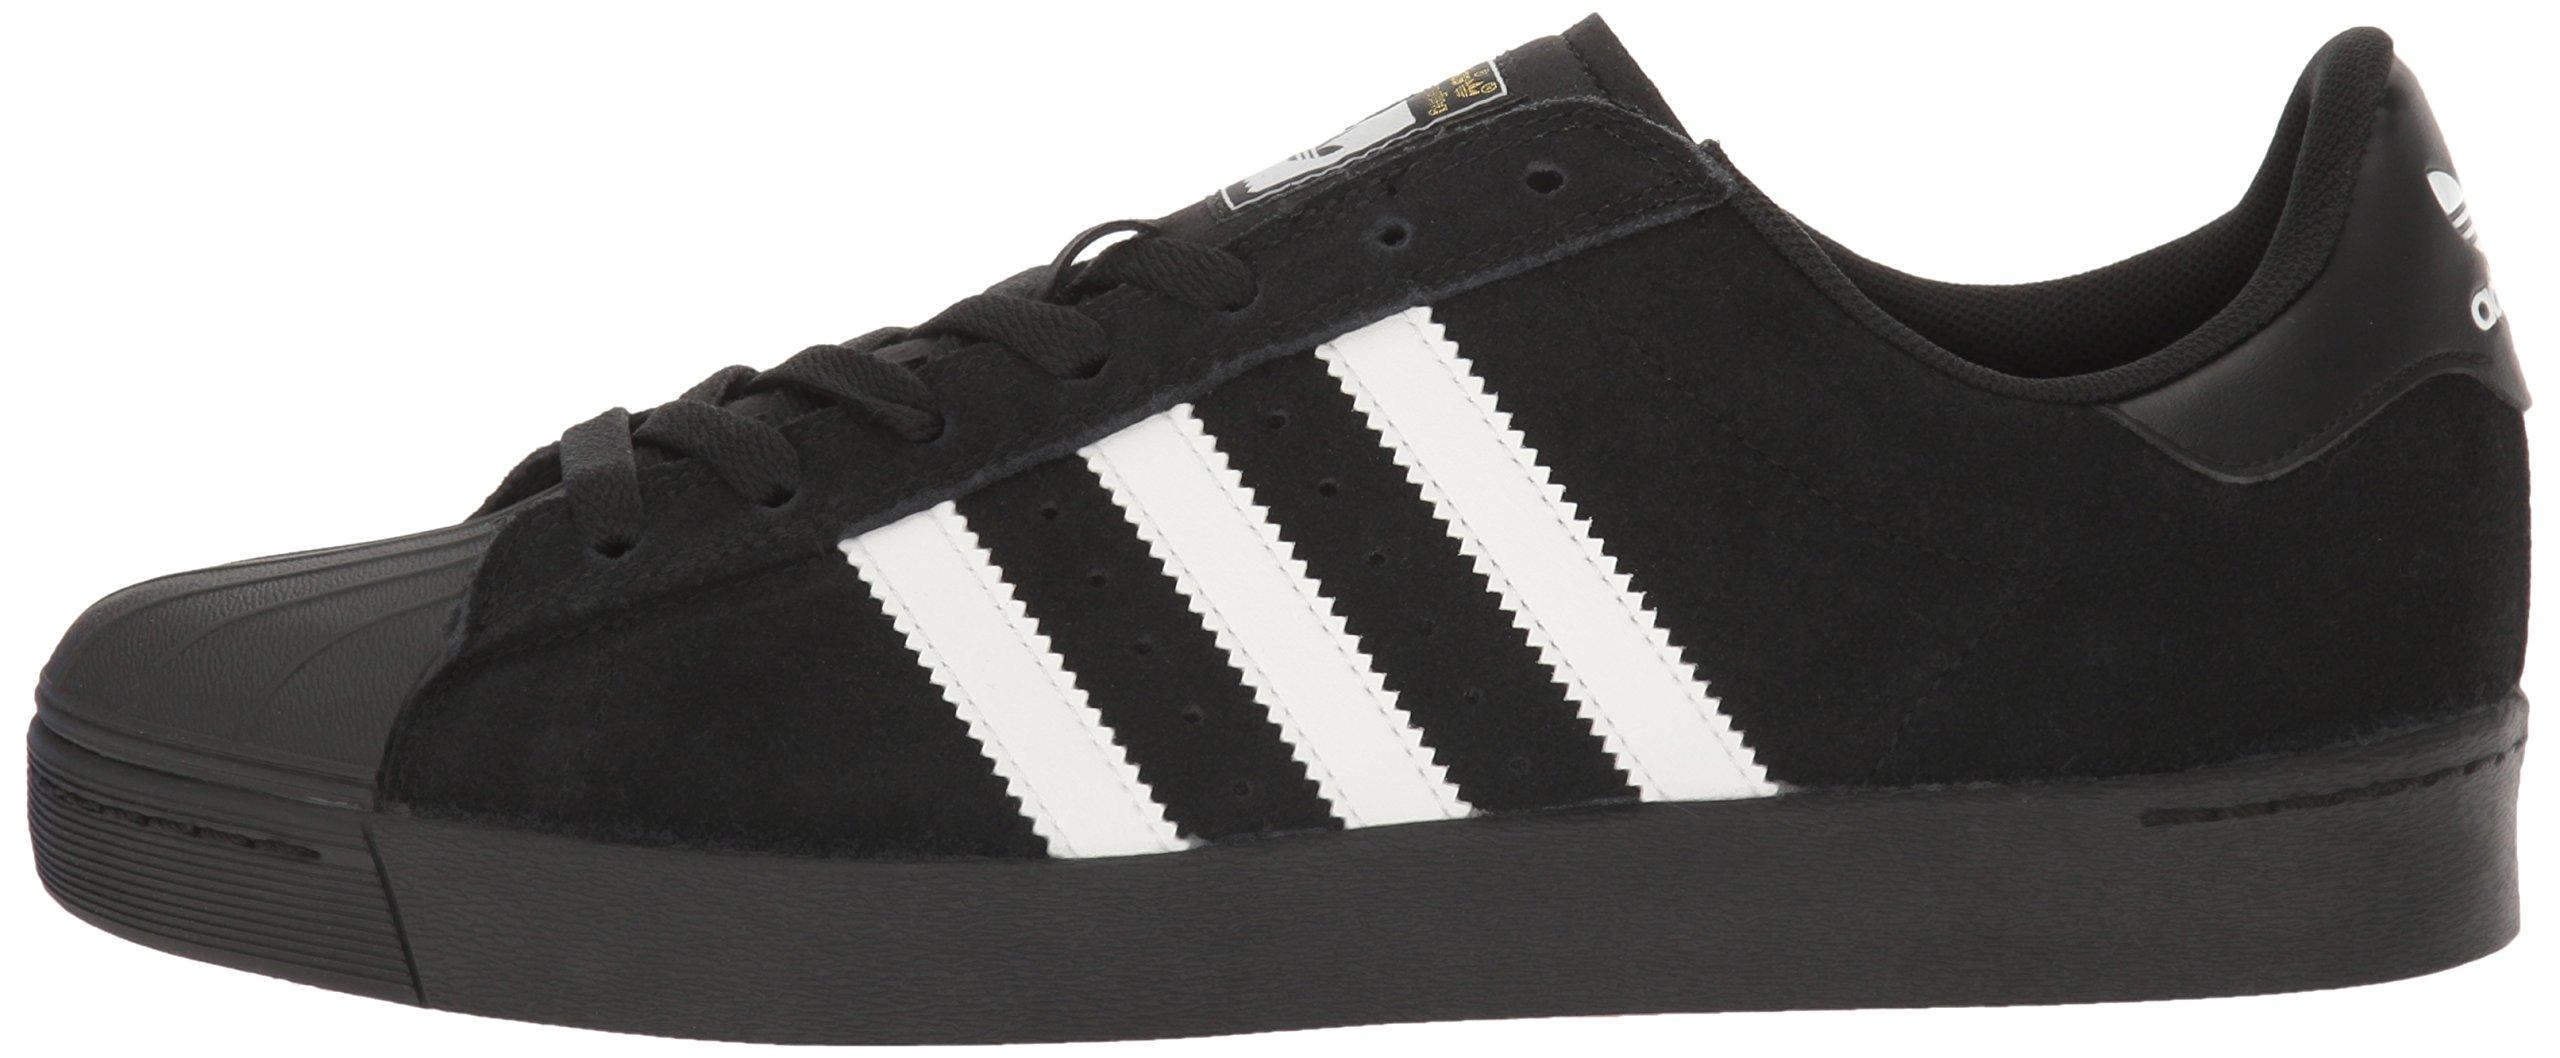 premium selection da6b5 cc919 adidas Originals Men s Shoes   Superstar Vulc Adv, Core Black White Core  Black, (11.5 M US) - AQ6861-100-11.5 M US   Skateboarding   Clothing, ...